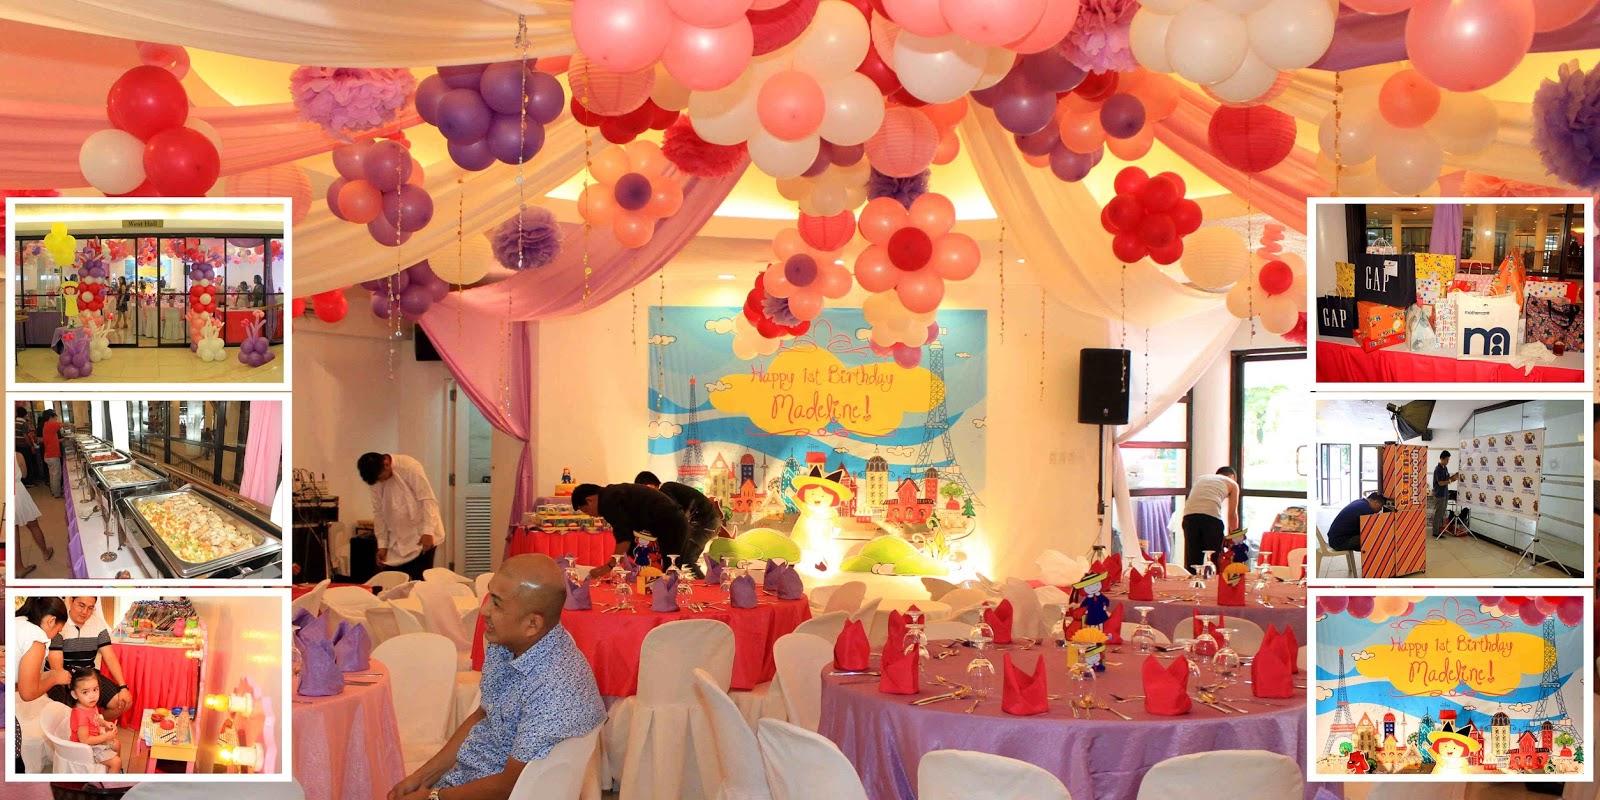 Madeline 1st birthday! KIDDIE PARTY PHOTOGRAPHER MANILA PHILIPPINES